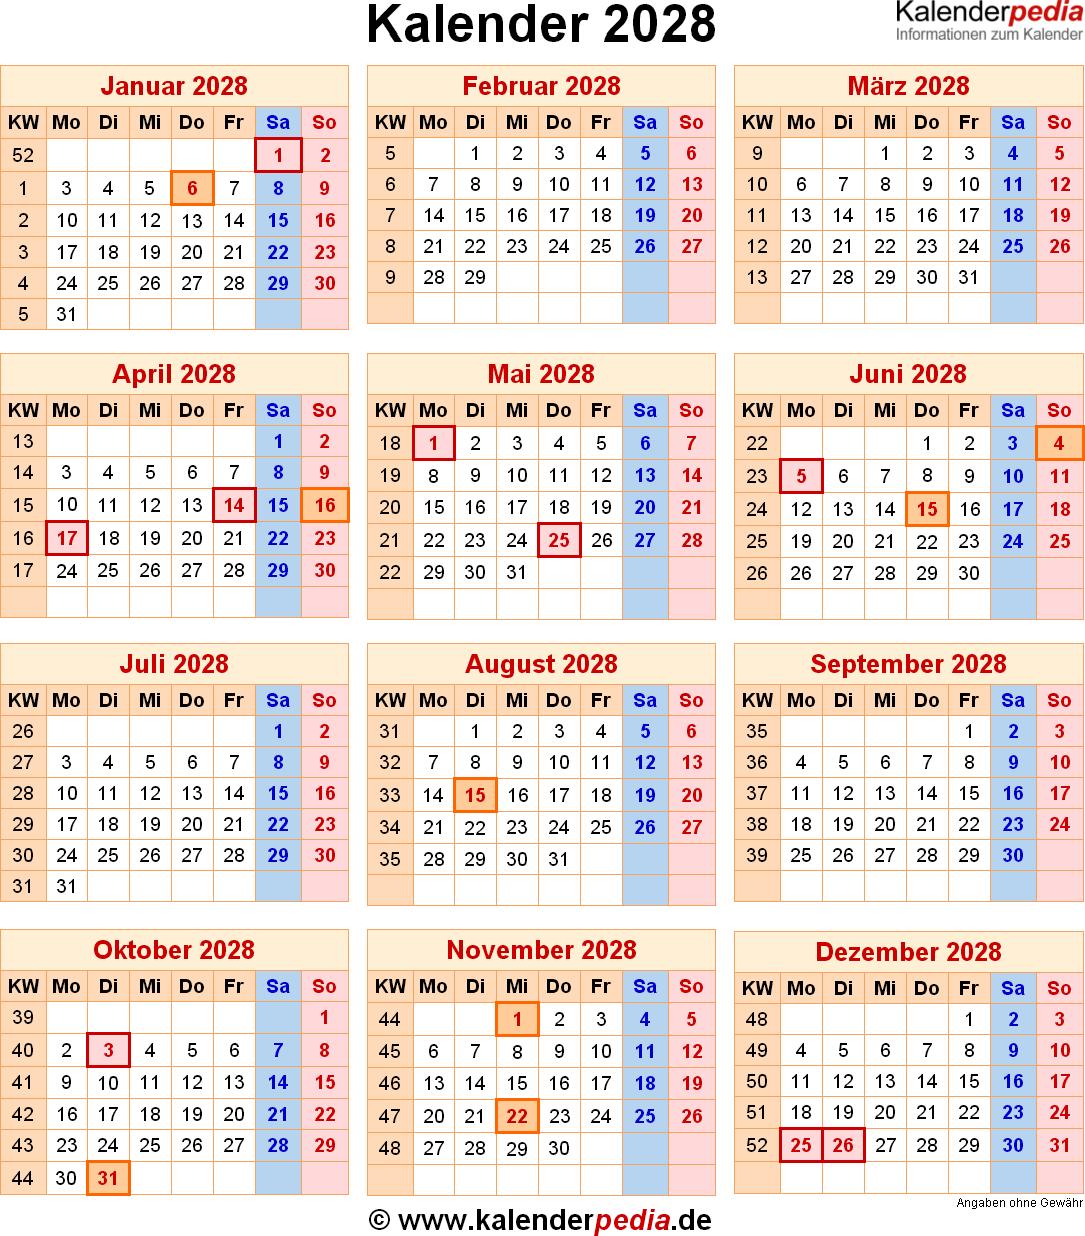 Kalender 2028